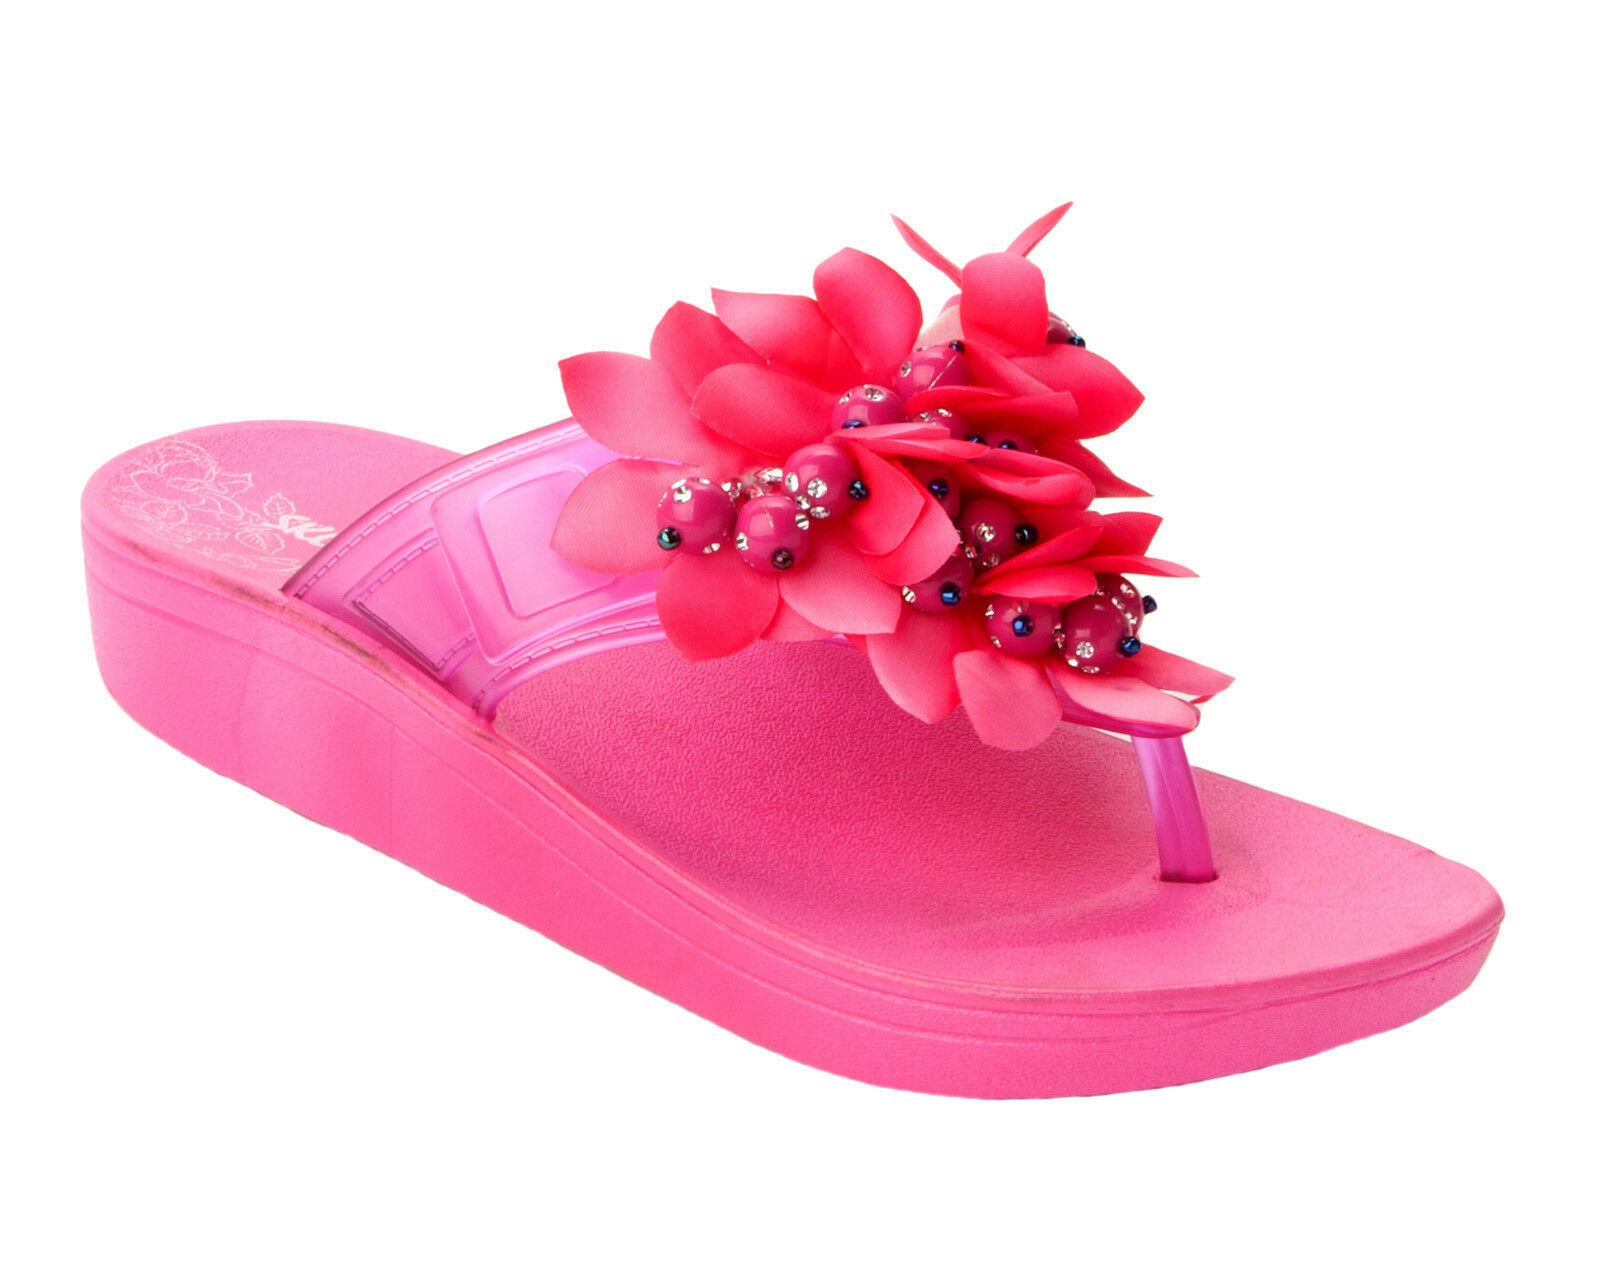 WOMENS FUSCHIA FLOP WEDGE DIAMANTE FLOWER FLIP FLOP FUSCHIA CASUAL SUMMER SANDALS LADIES SIZE 751525